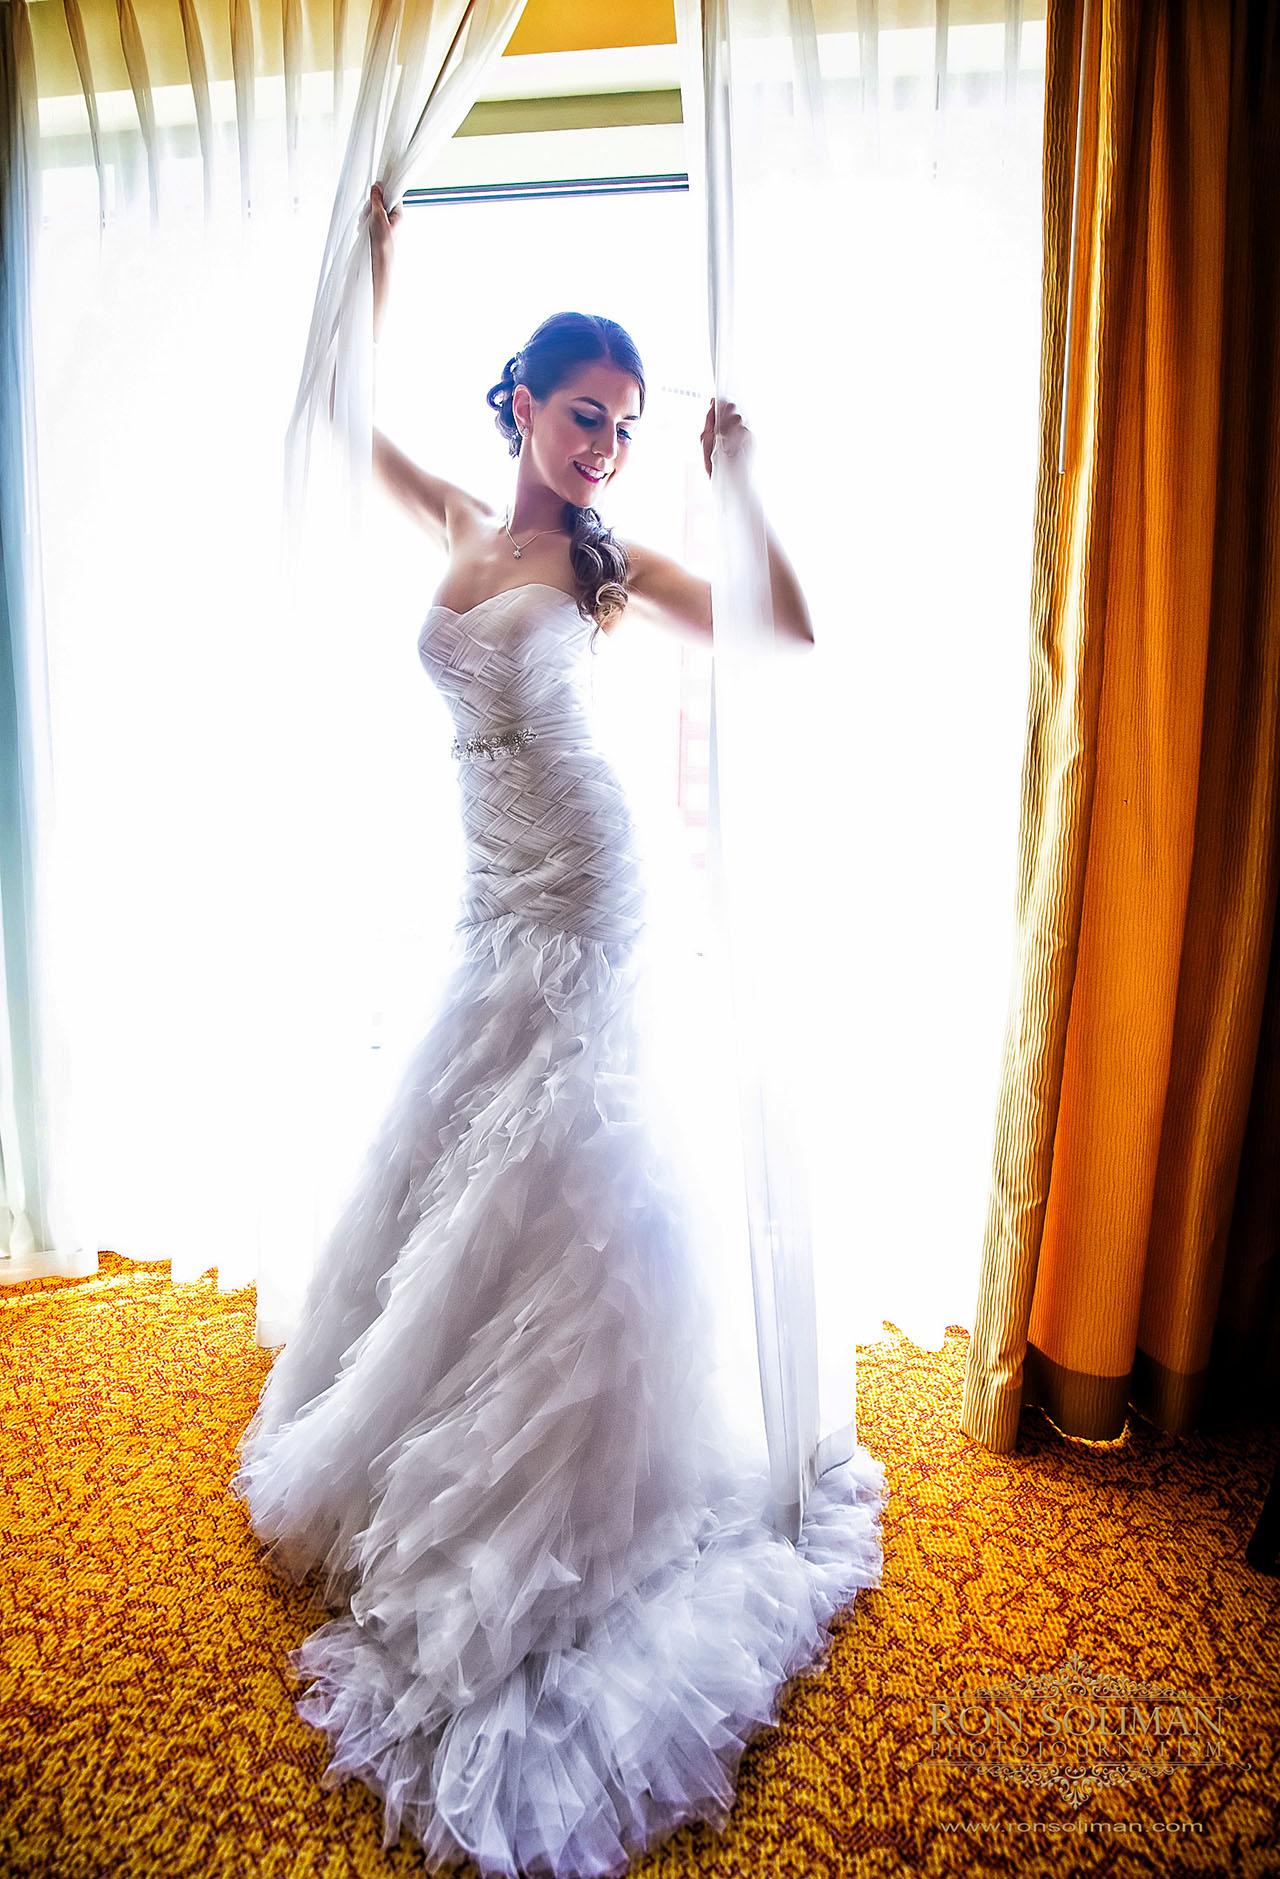 BETHESDA MARRIOTT WEDDING